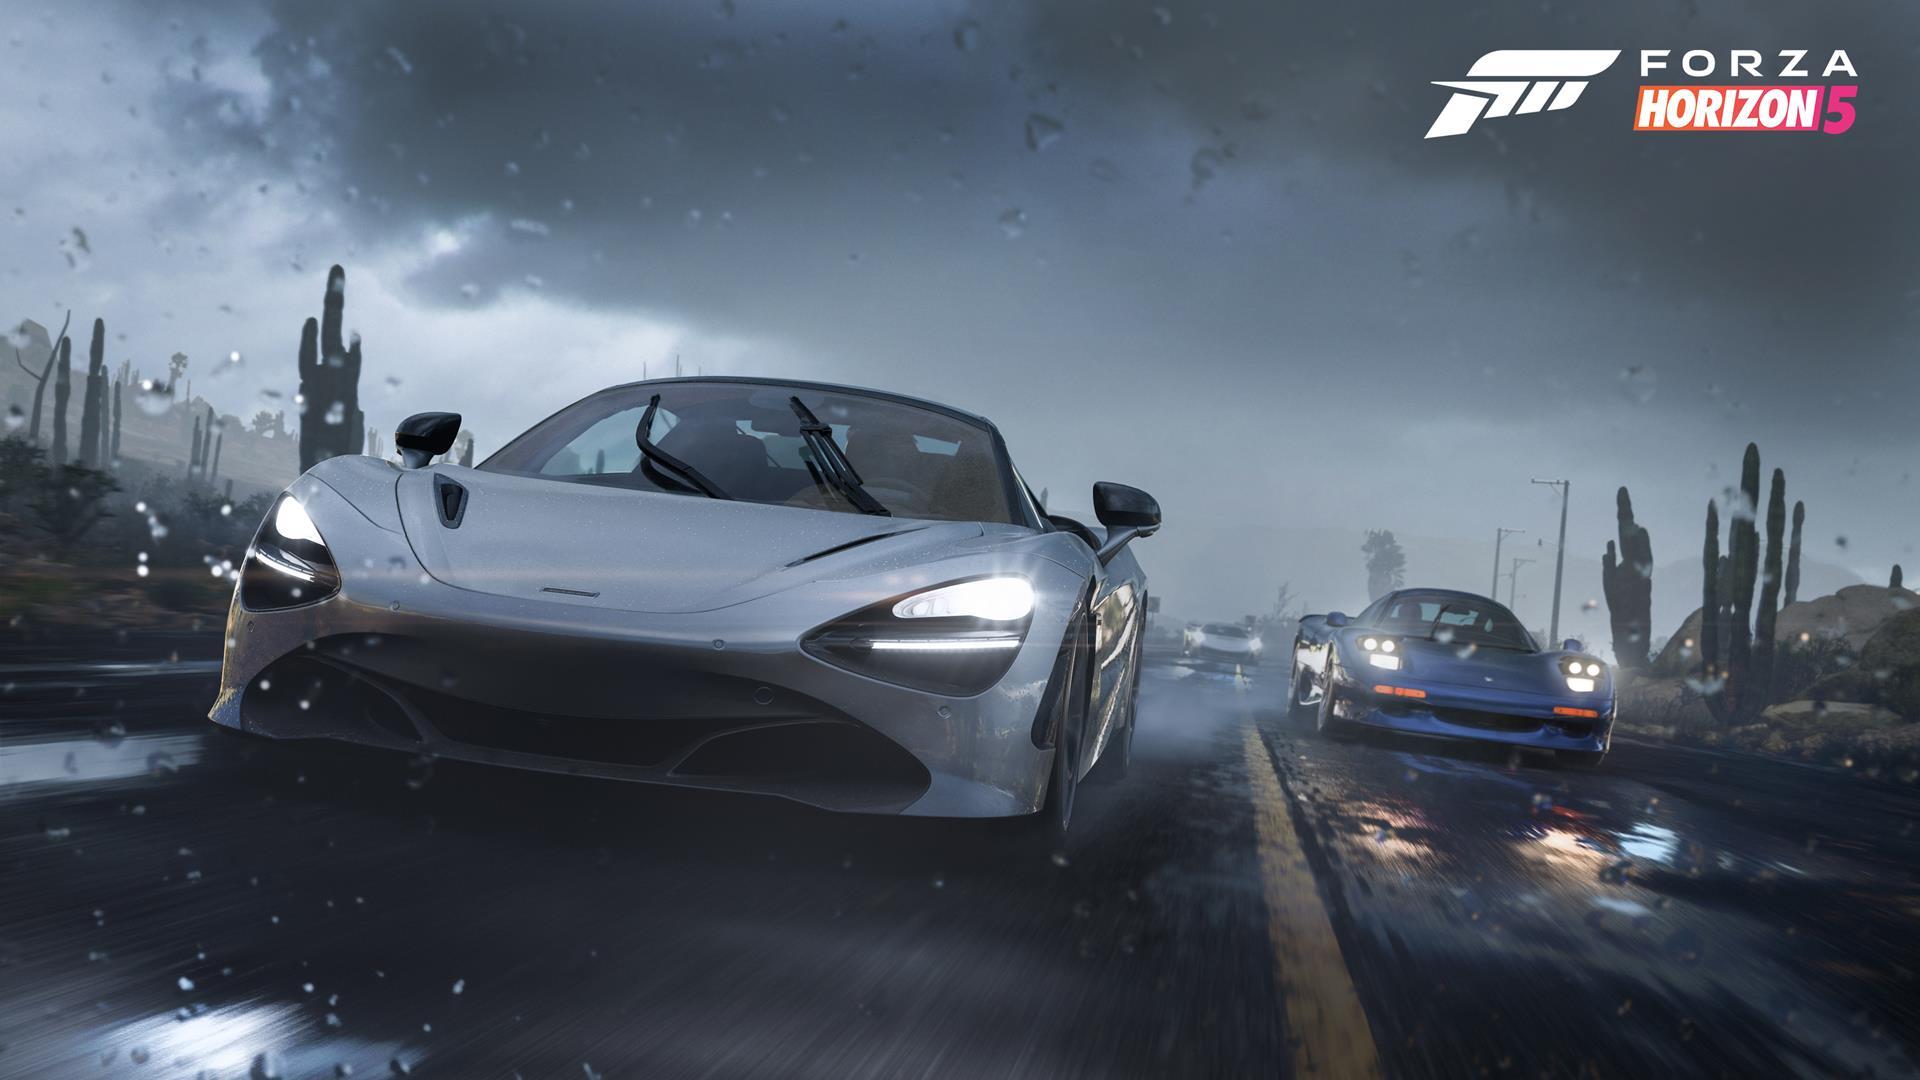 Image for Forza Horizon 5 takes the series to Mexico in November